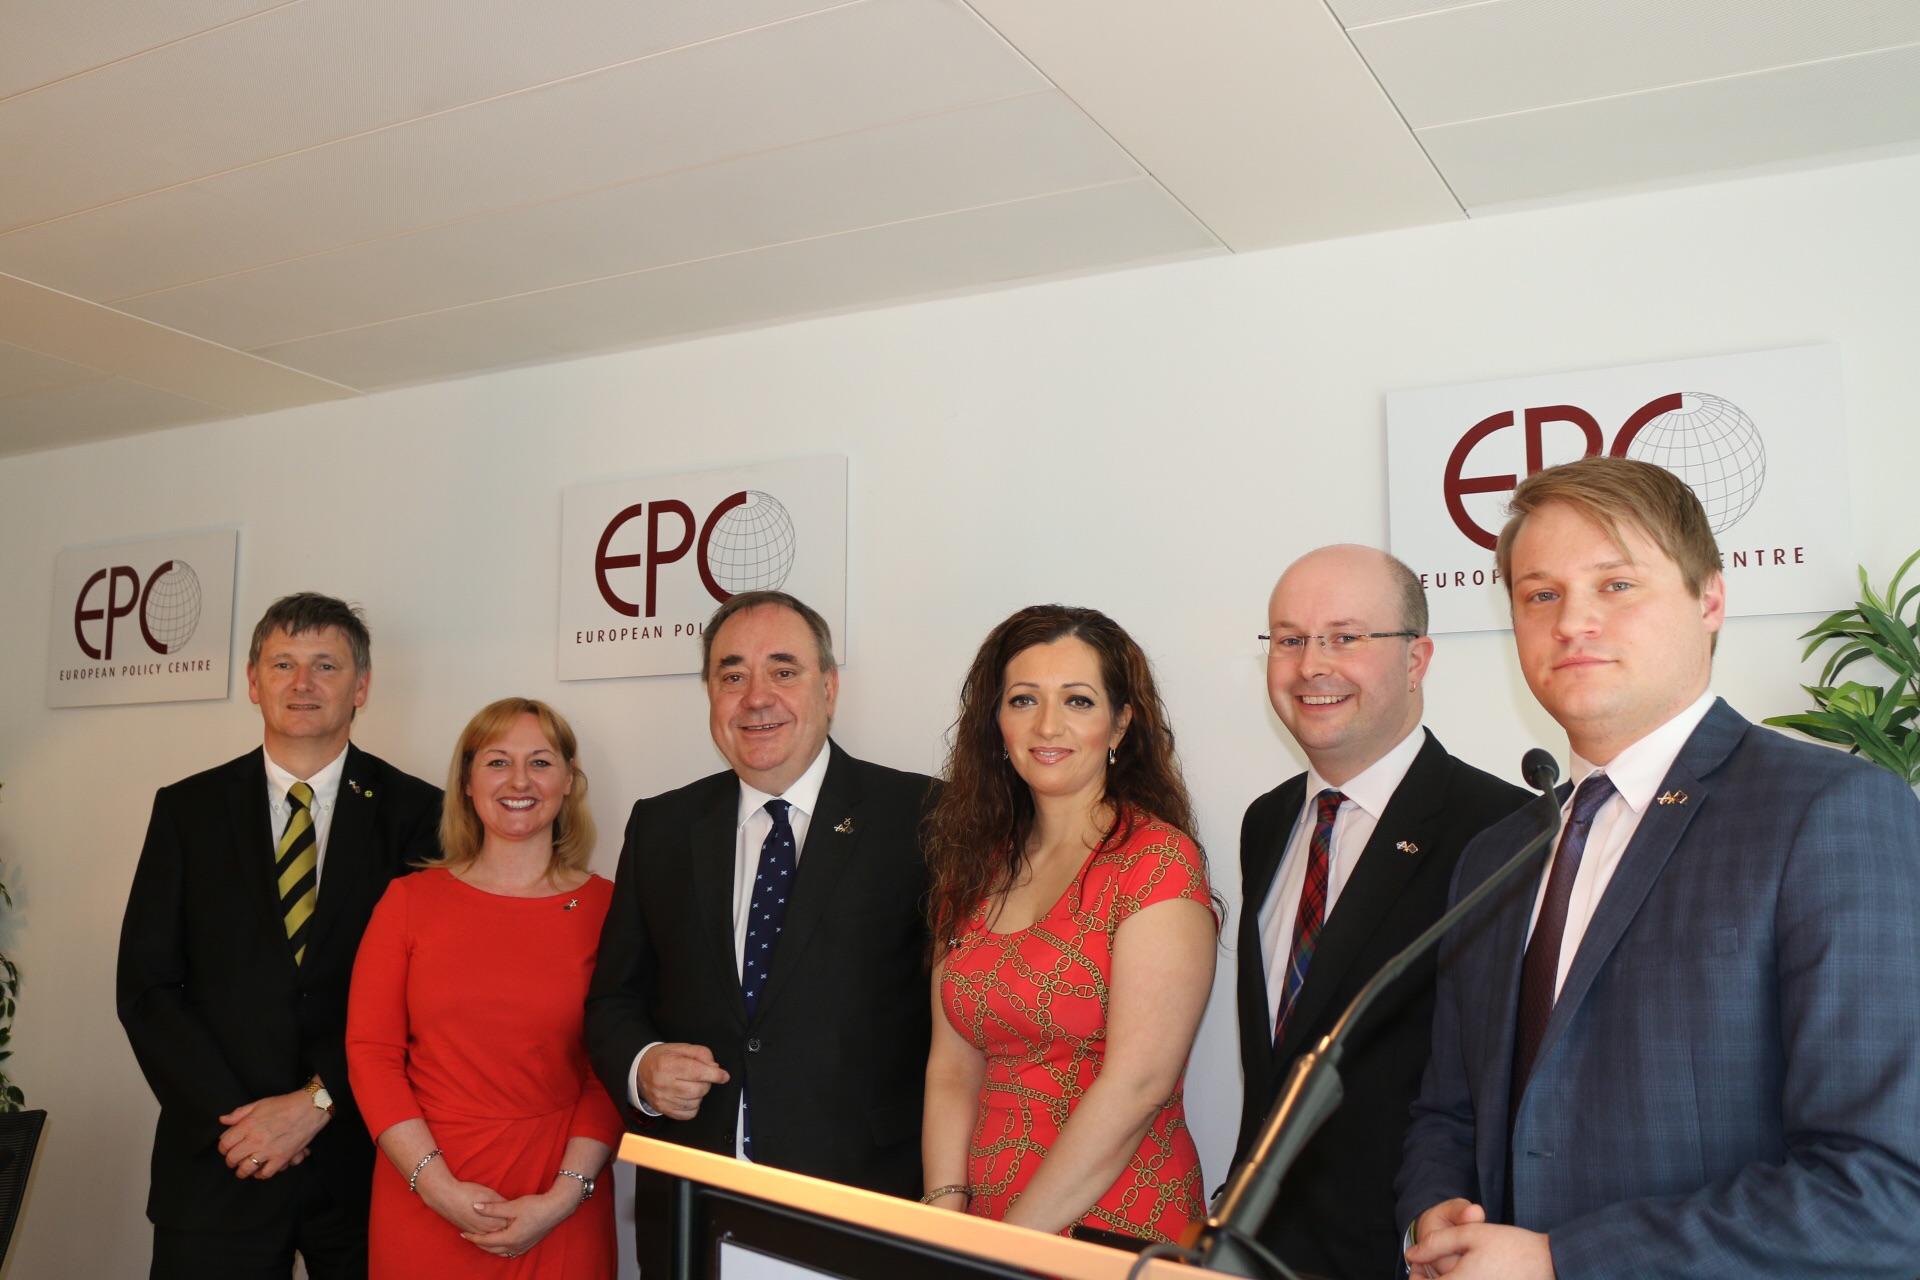 Peter Grant MP, Lisa Cameron MP, Alex Salmond MP, Tasmina Ahmed-Sheikh MP, Patrick Grady MP, Stuart Donaldson MP.